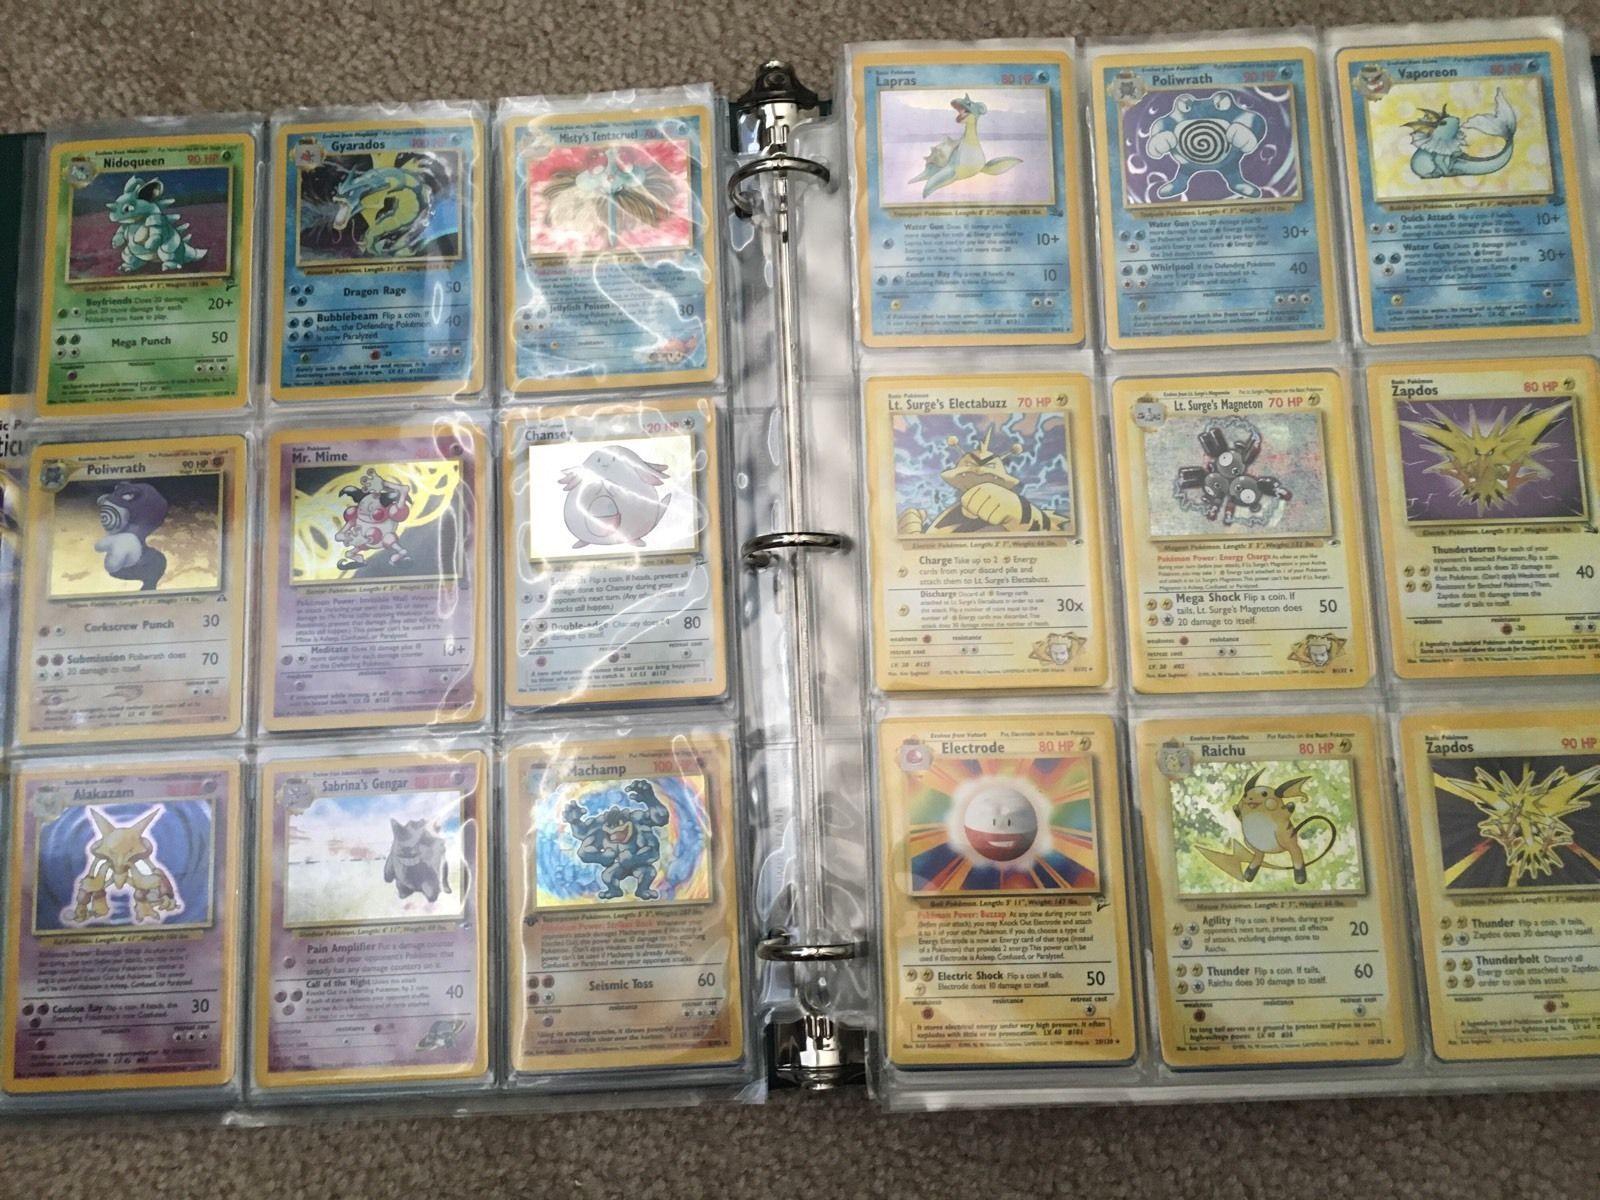 50x HUGE ALL ORIGINAL WOTC Pokemon Card LOT BULK COMMON/UNC + HOLO and 3 RARE